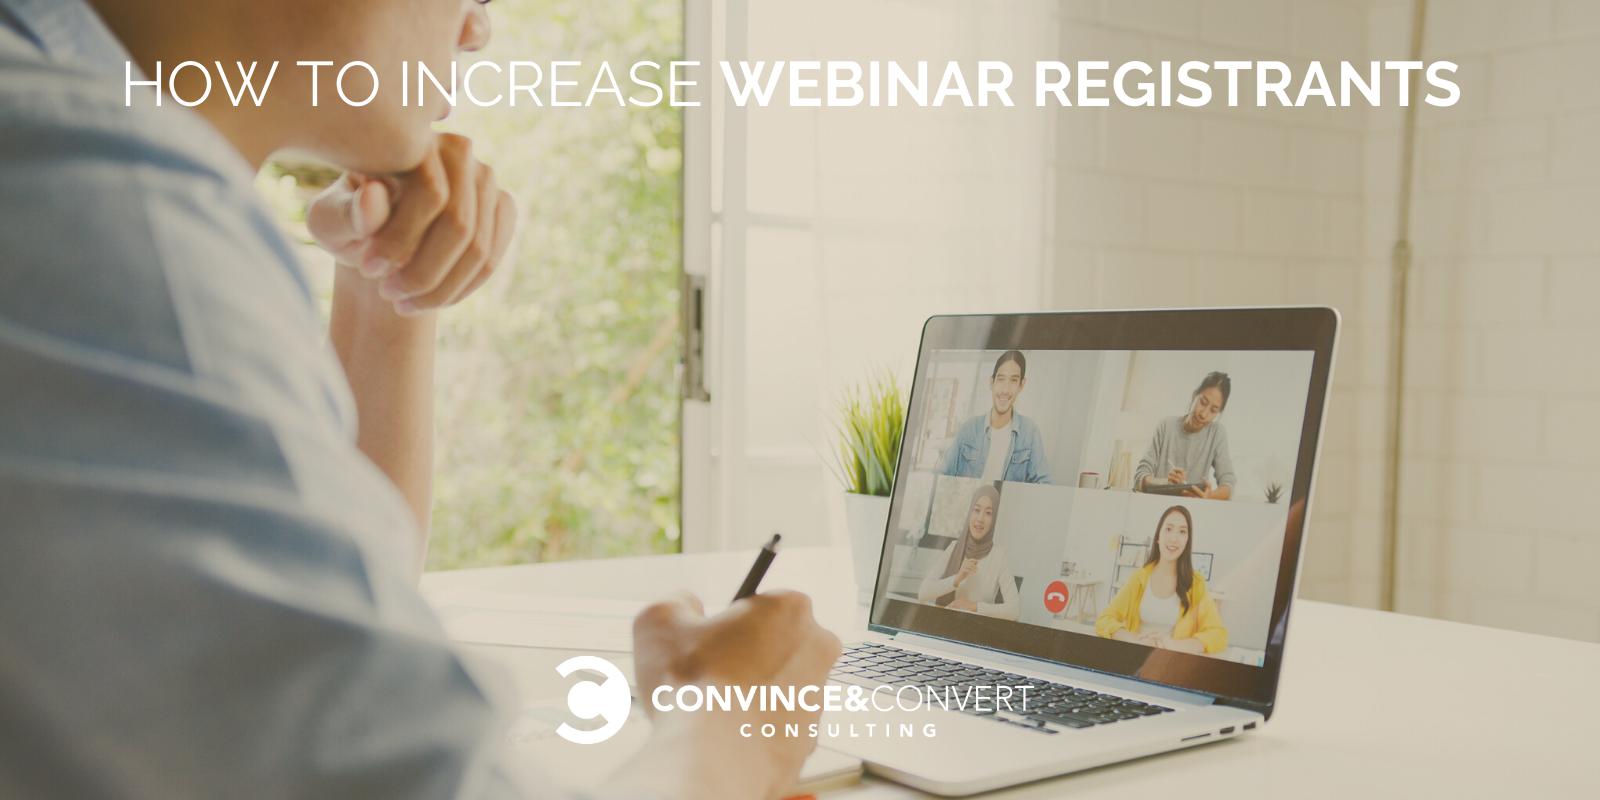 How to Increase Webinar Registrants